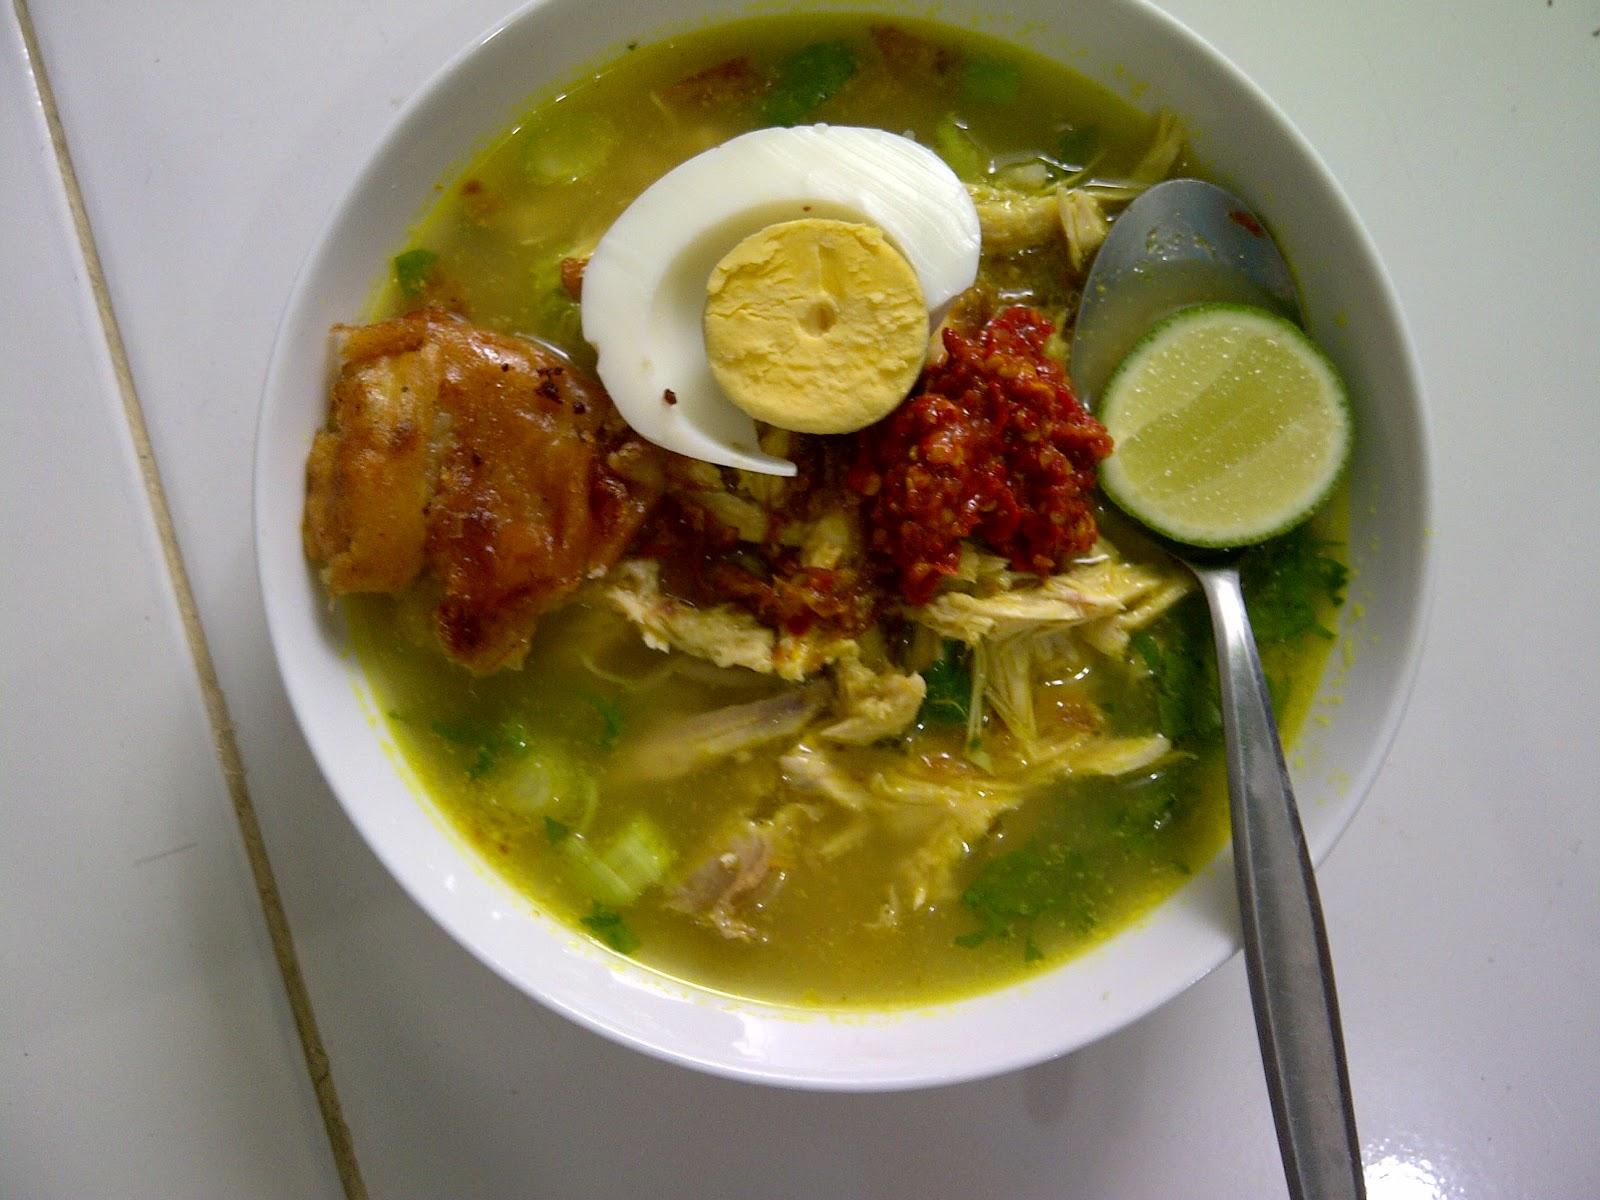 Resep Sayur Sop Ayam Bakso